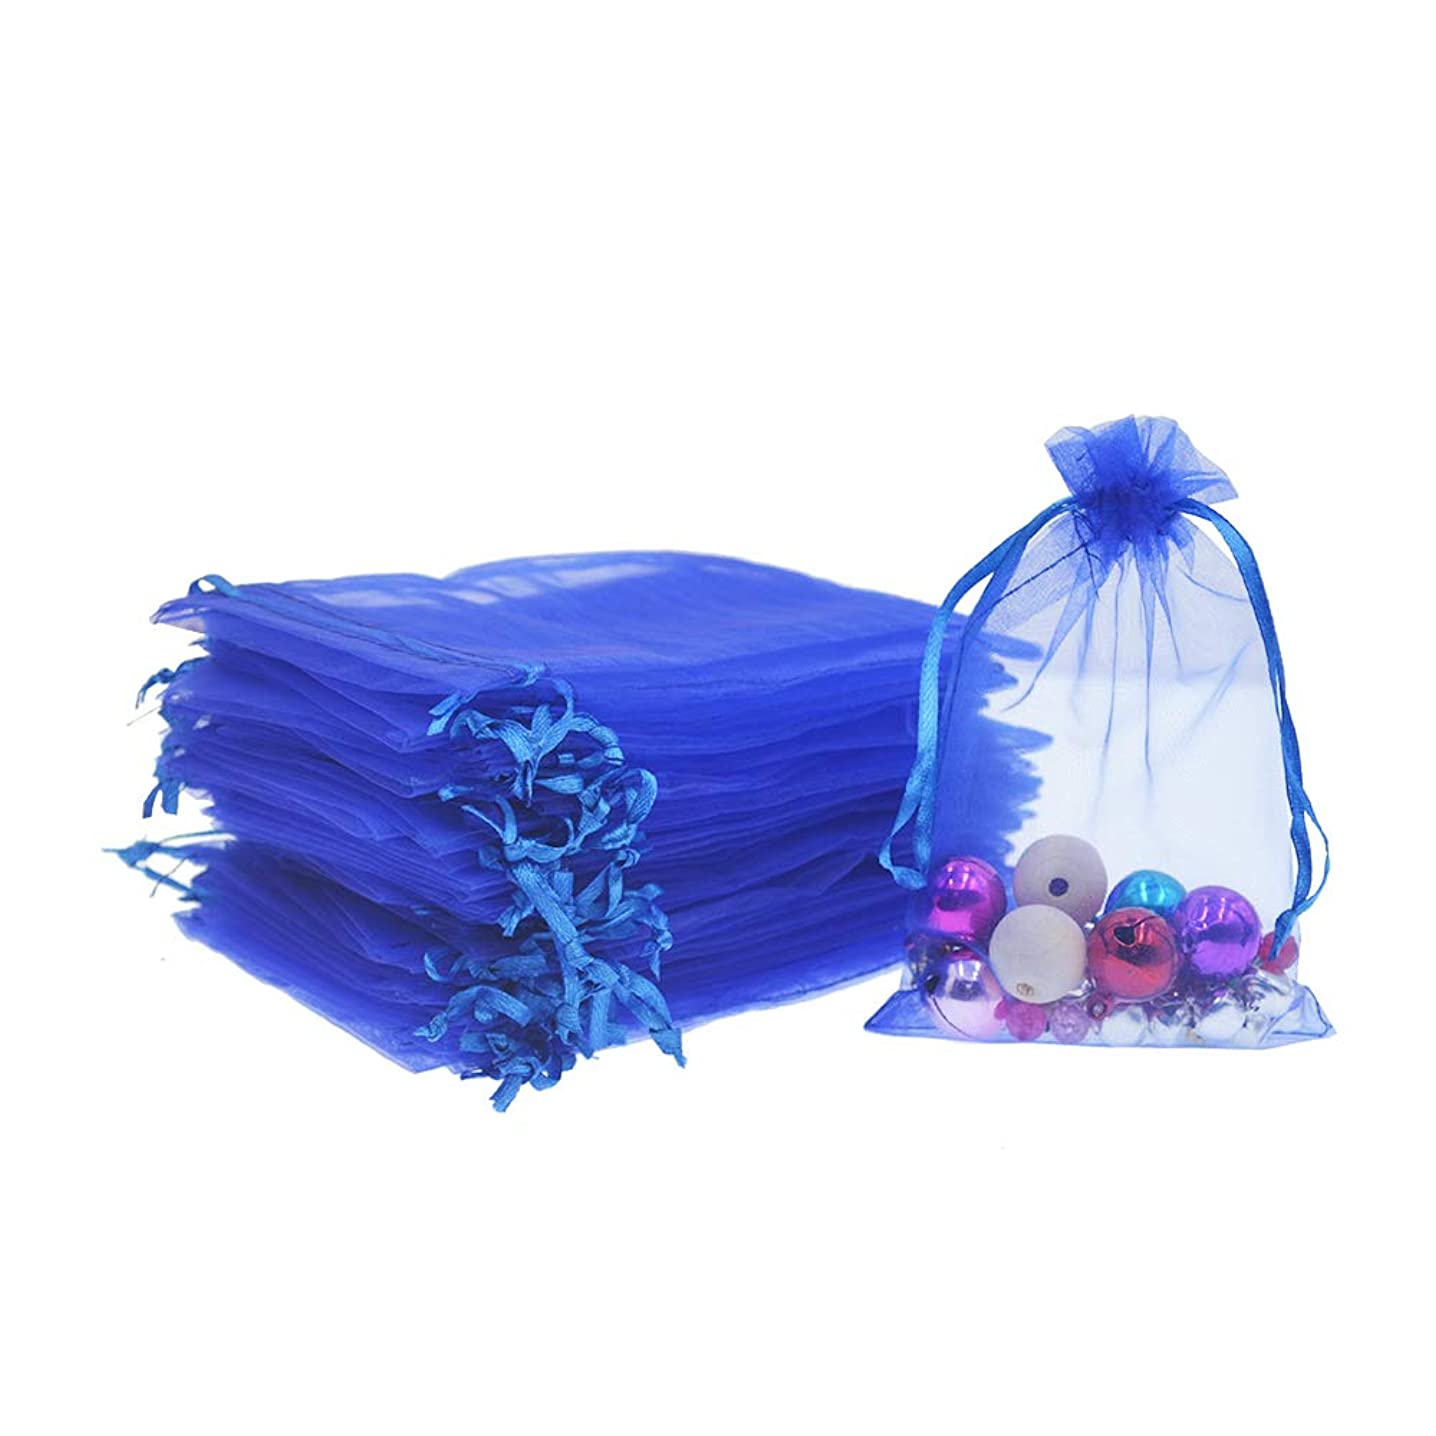 Lautechco 100Pcs Organza Bags 3.5x4.5 inches Royal Blue Organza Gift Bags Small Mesh Bags Drawstring Gift Bags Christmas Drawstring Organza Gift Bags (3.5x4.5 inches Royal Blue)